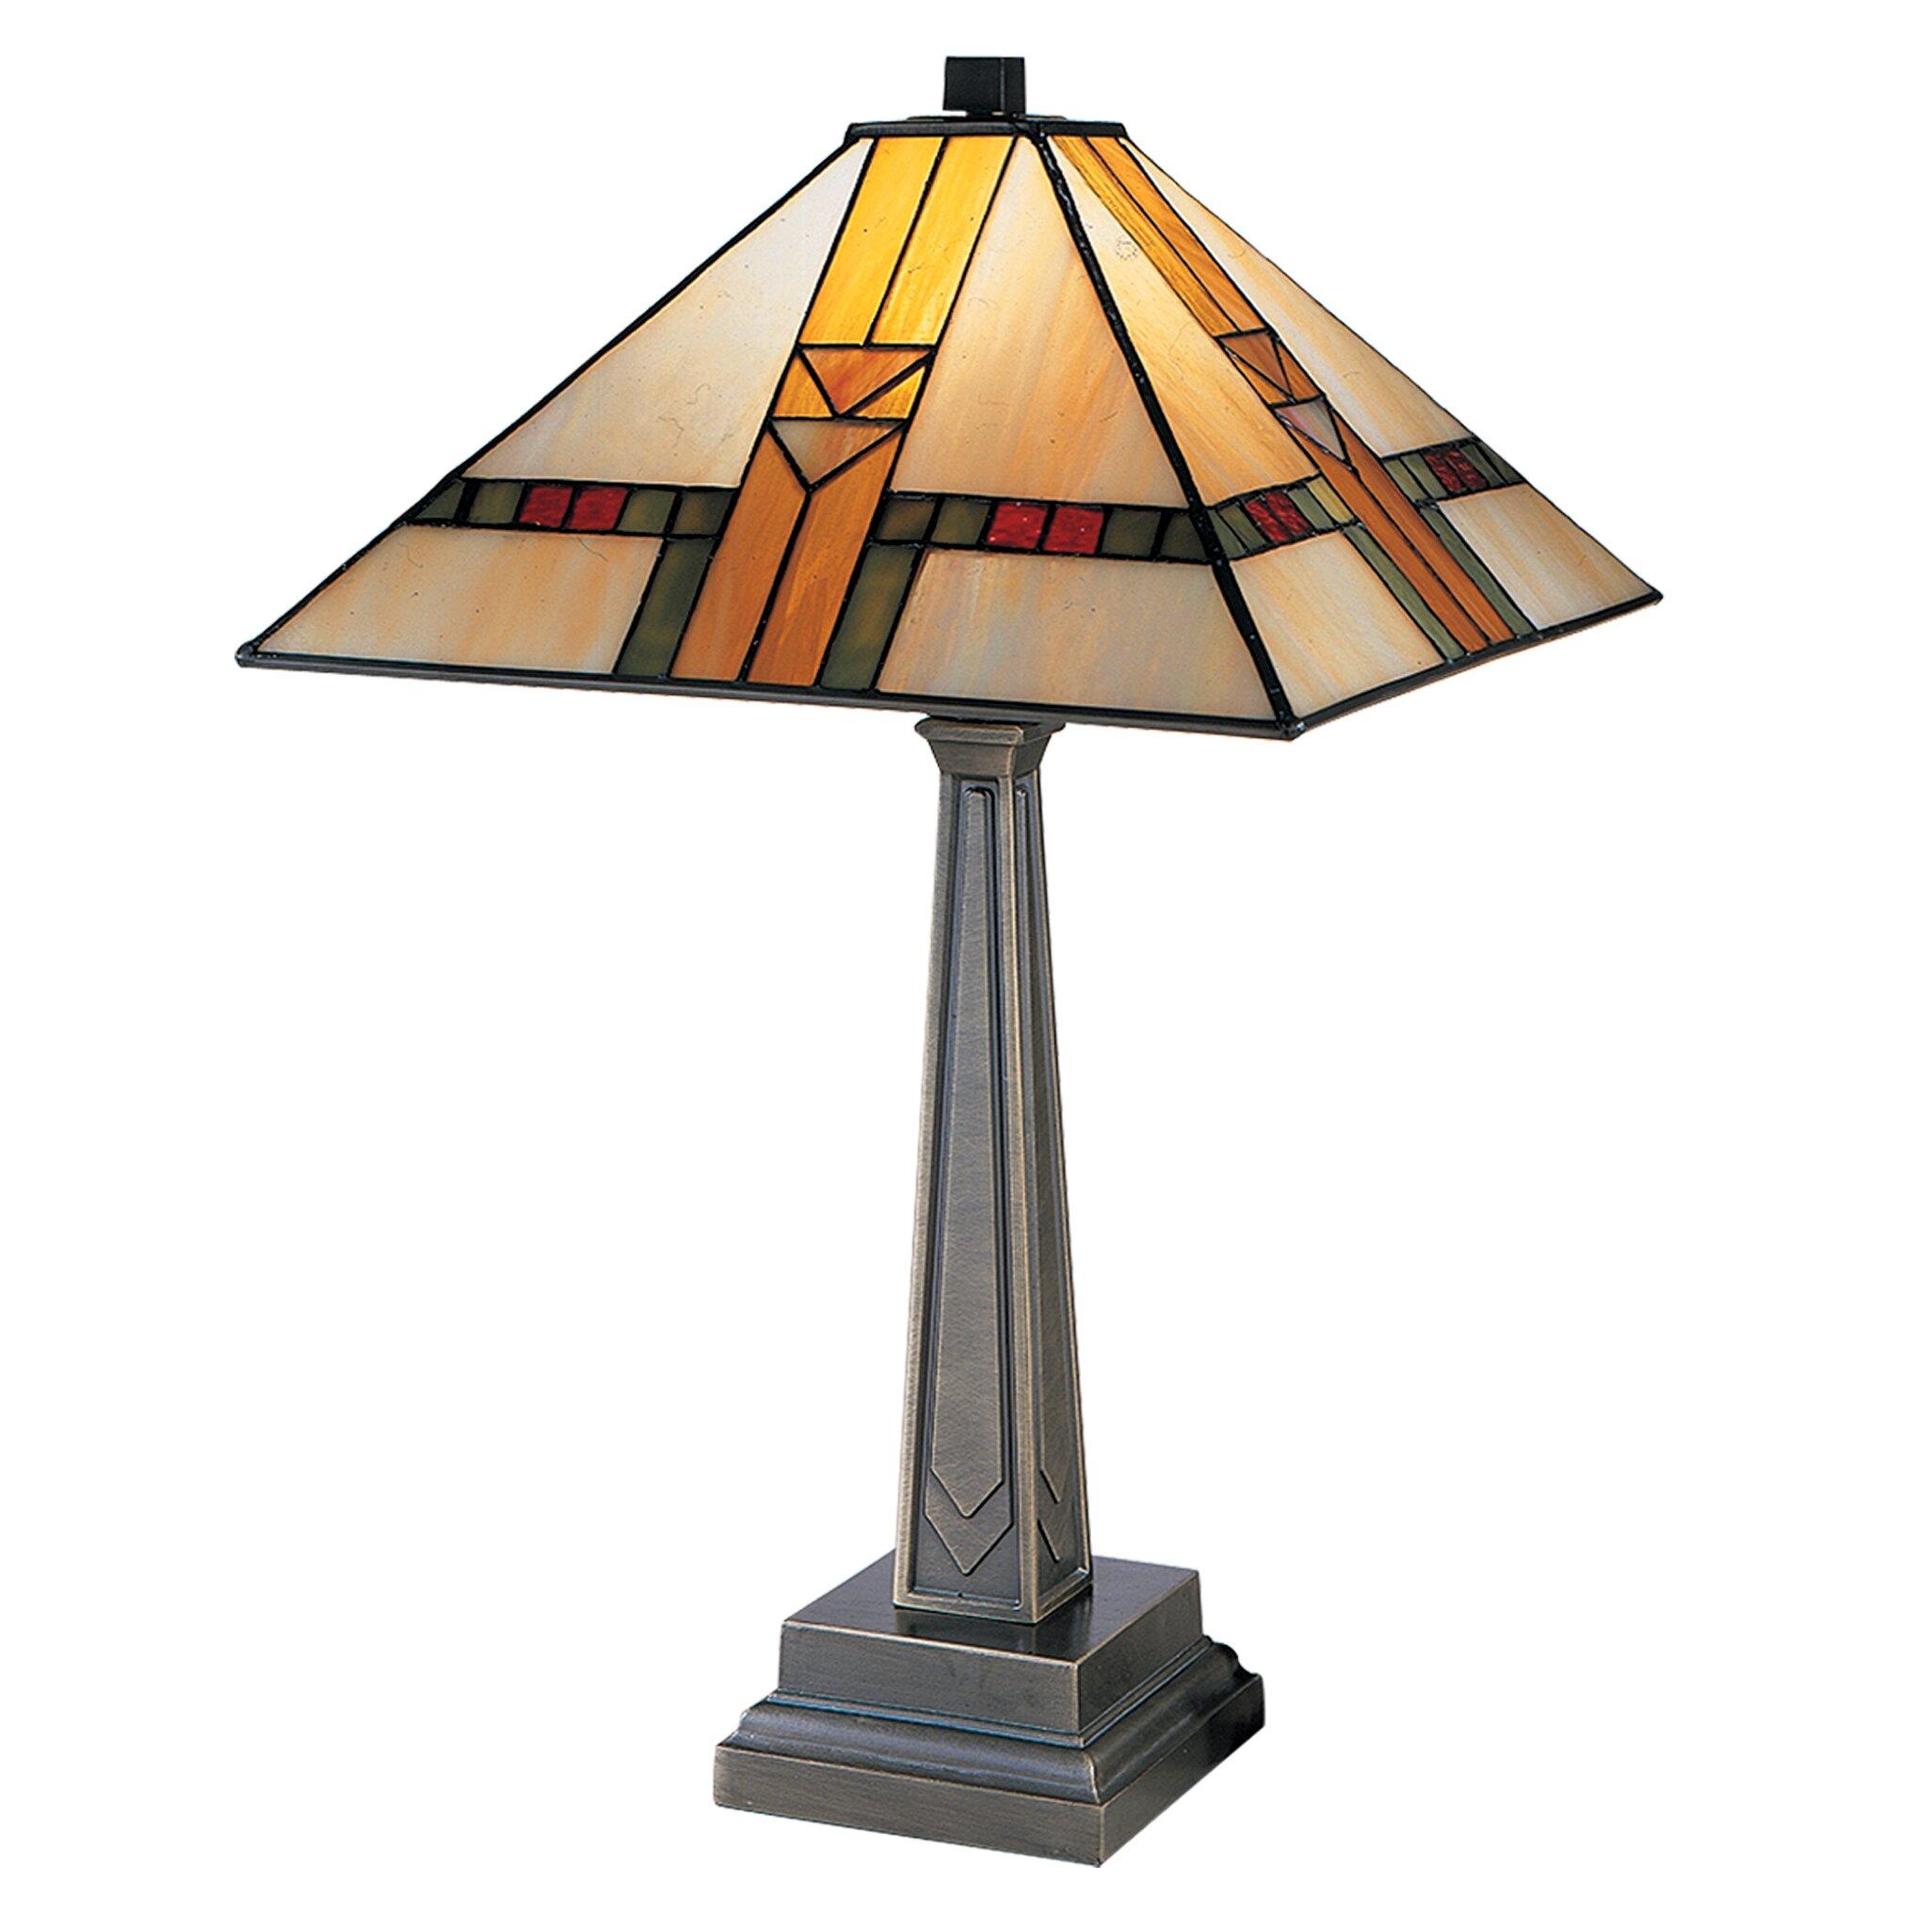 Dale Tiffany Edmund 2075 Table Lamp Amp Reviews